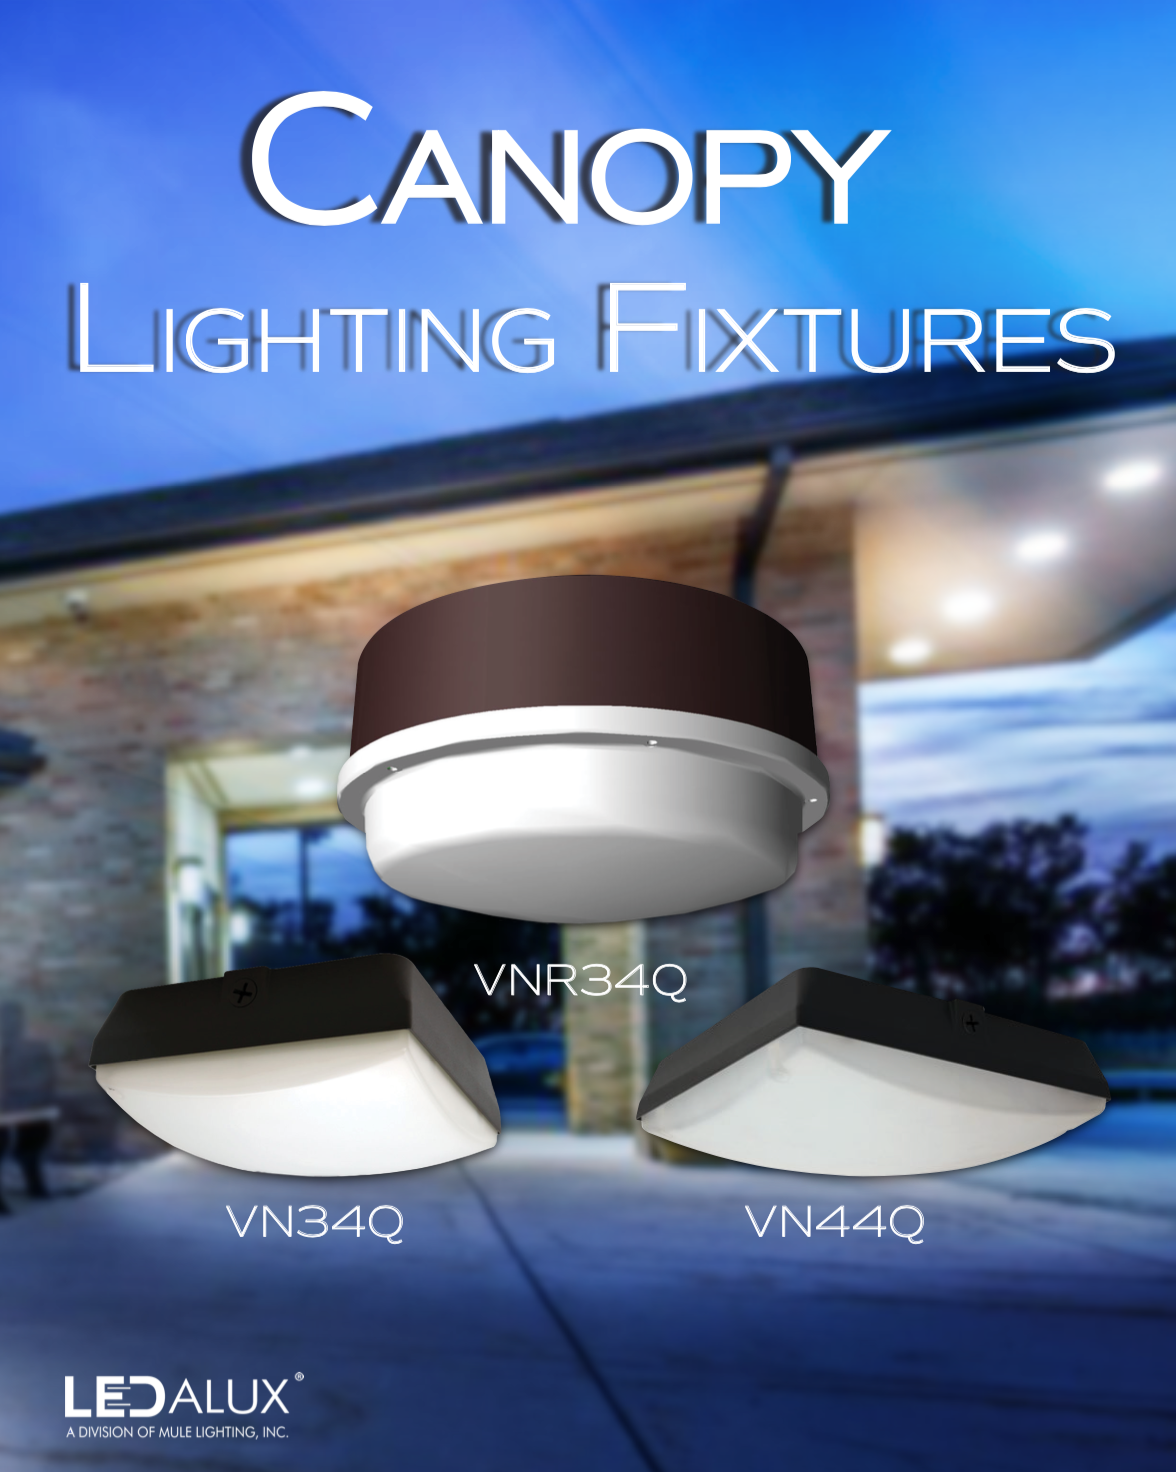 LEDalux Canopy Lighting Fixtures Literature